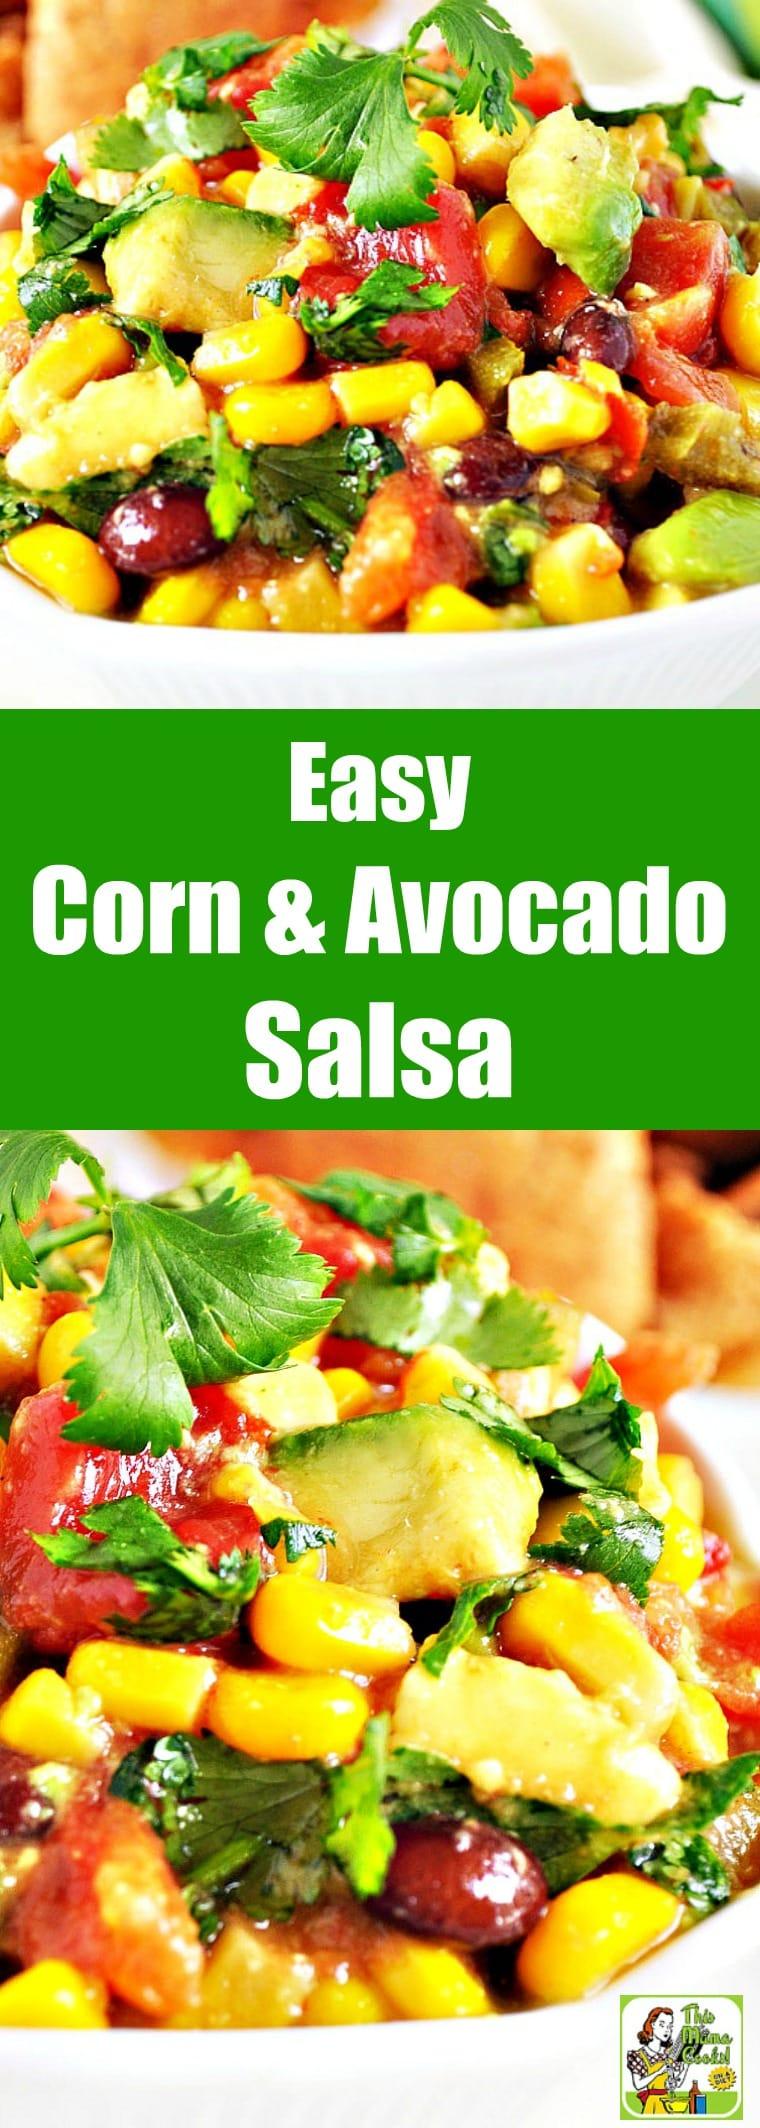 Super Easy Corn & Avocado Salsa